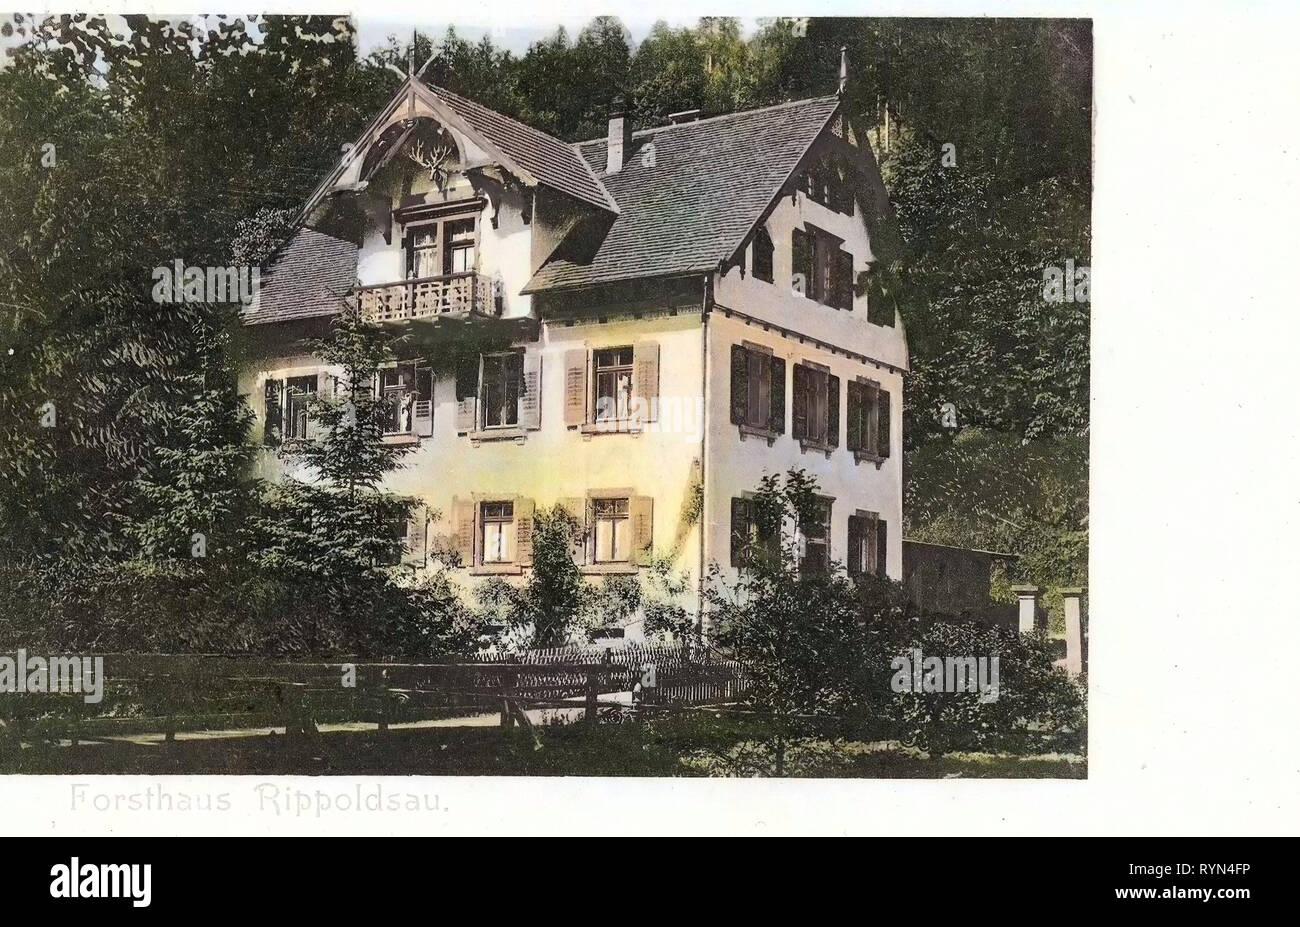 Category, Rippoldsau, 1904, Forsthaus - Stock Image